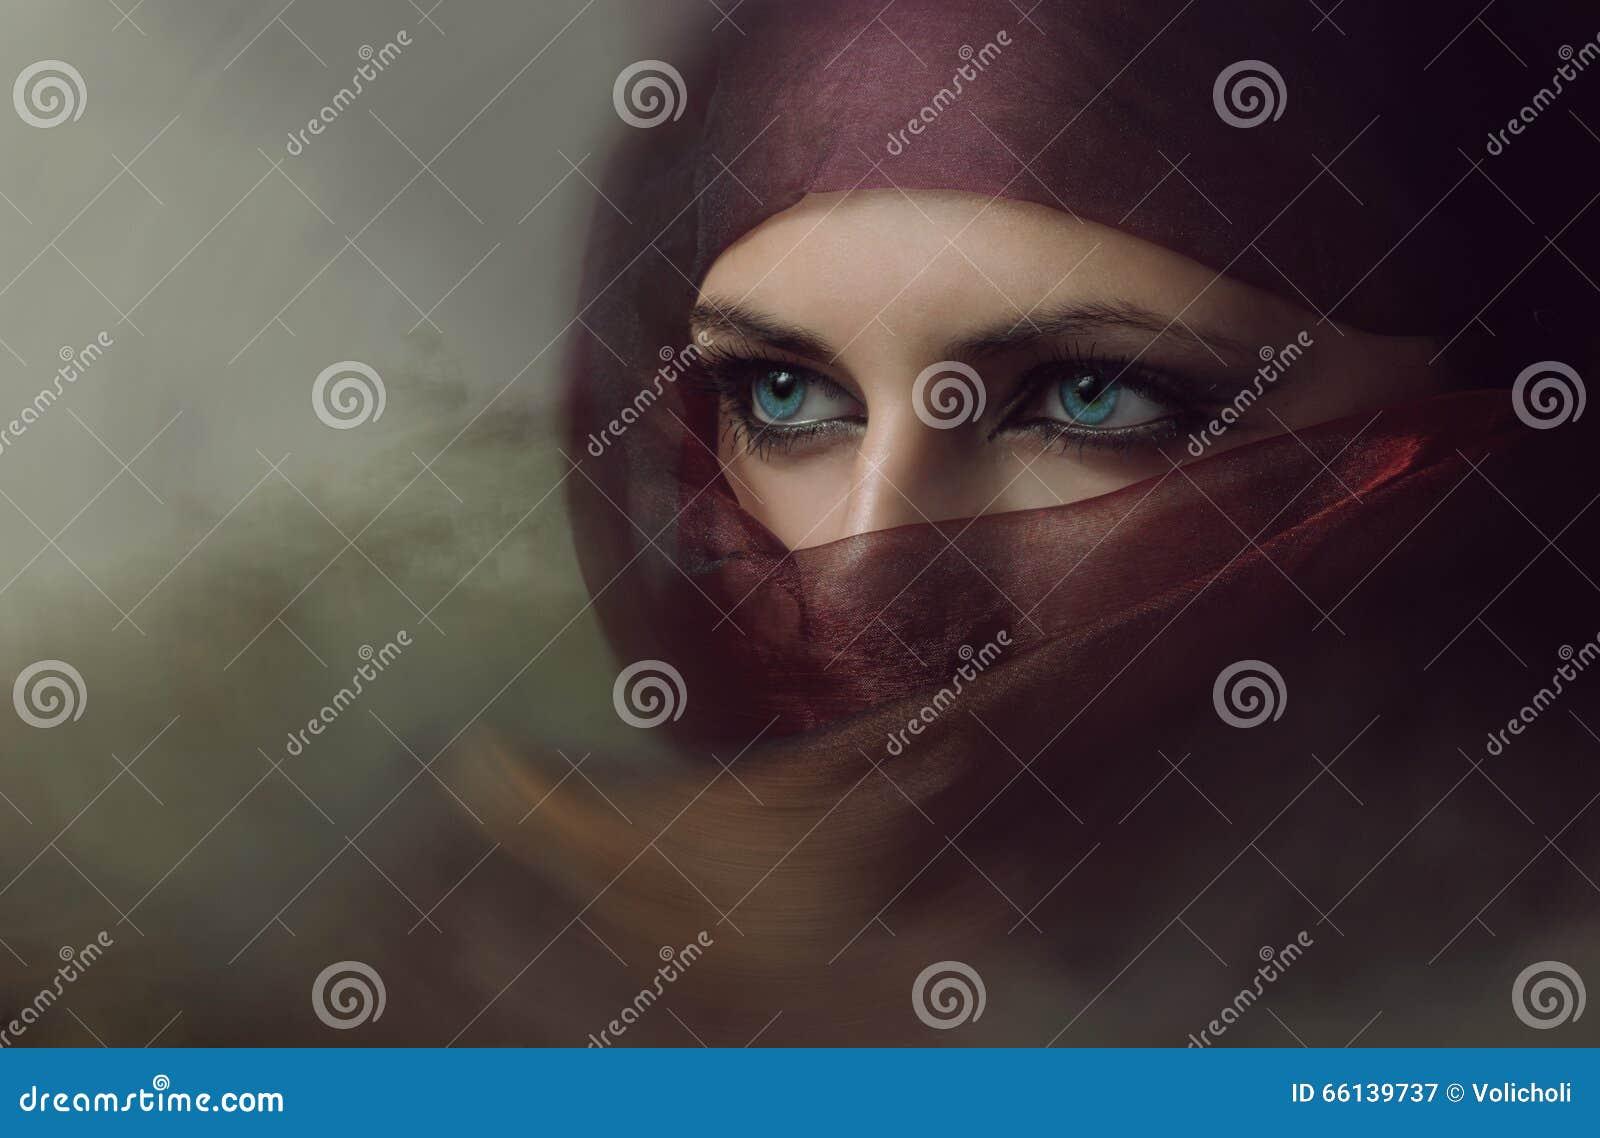 Hijab的年轻阿拉伯妇女与性感的蓝眼睛